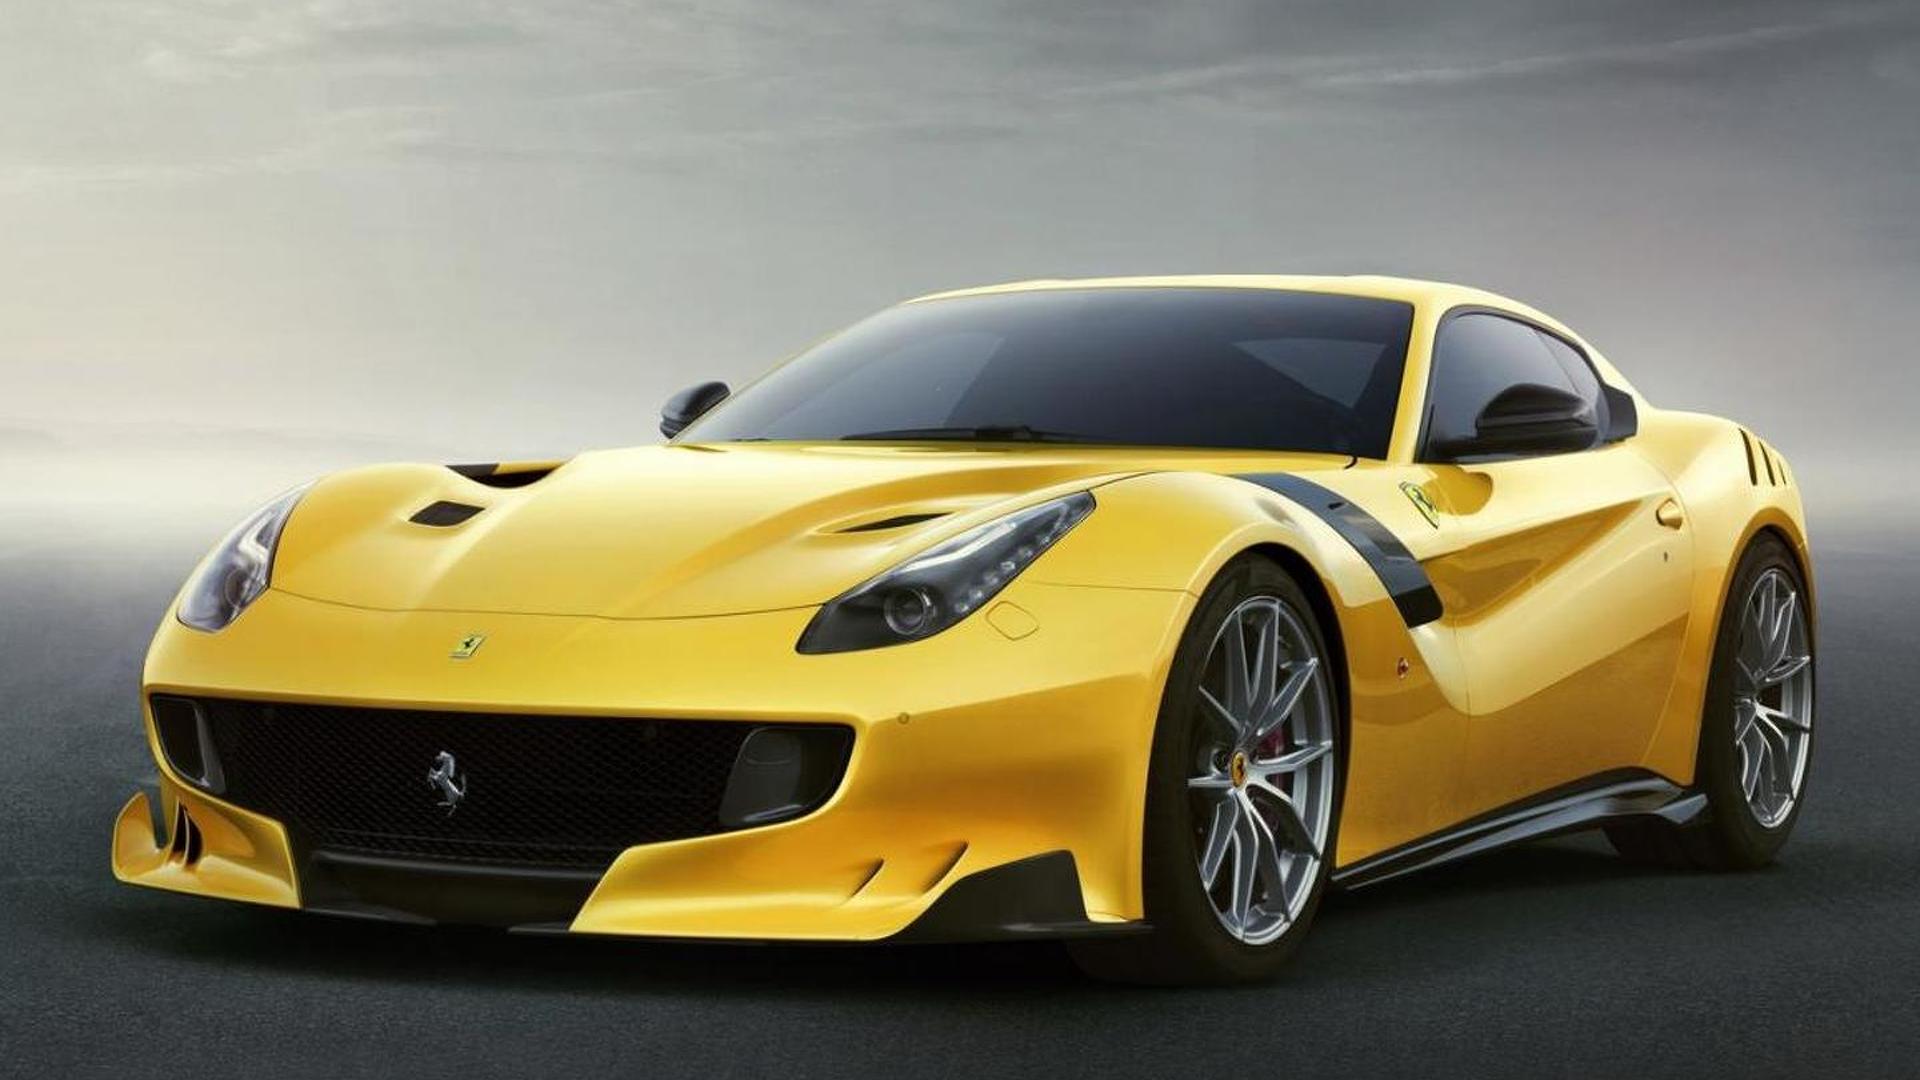 Ferrari F12tdf breaks cover with 780 PS